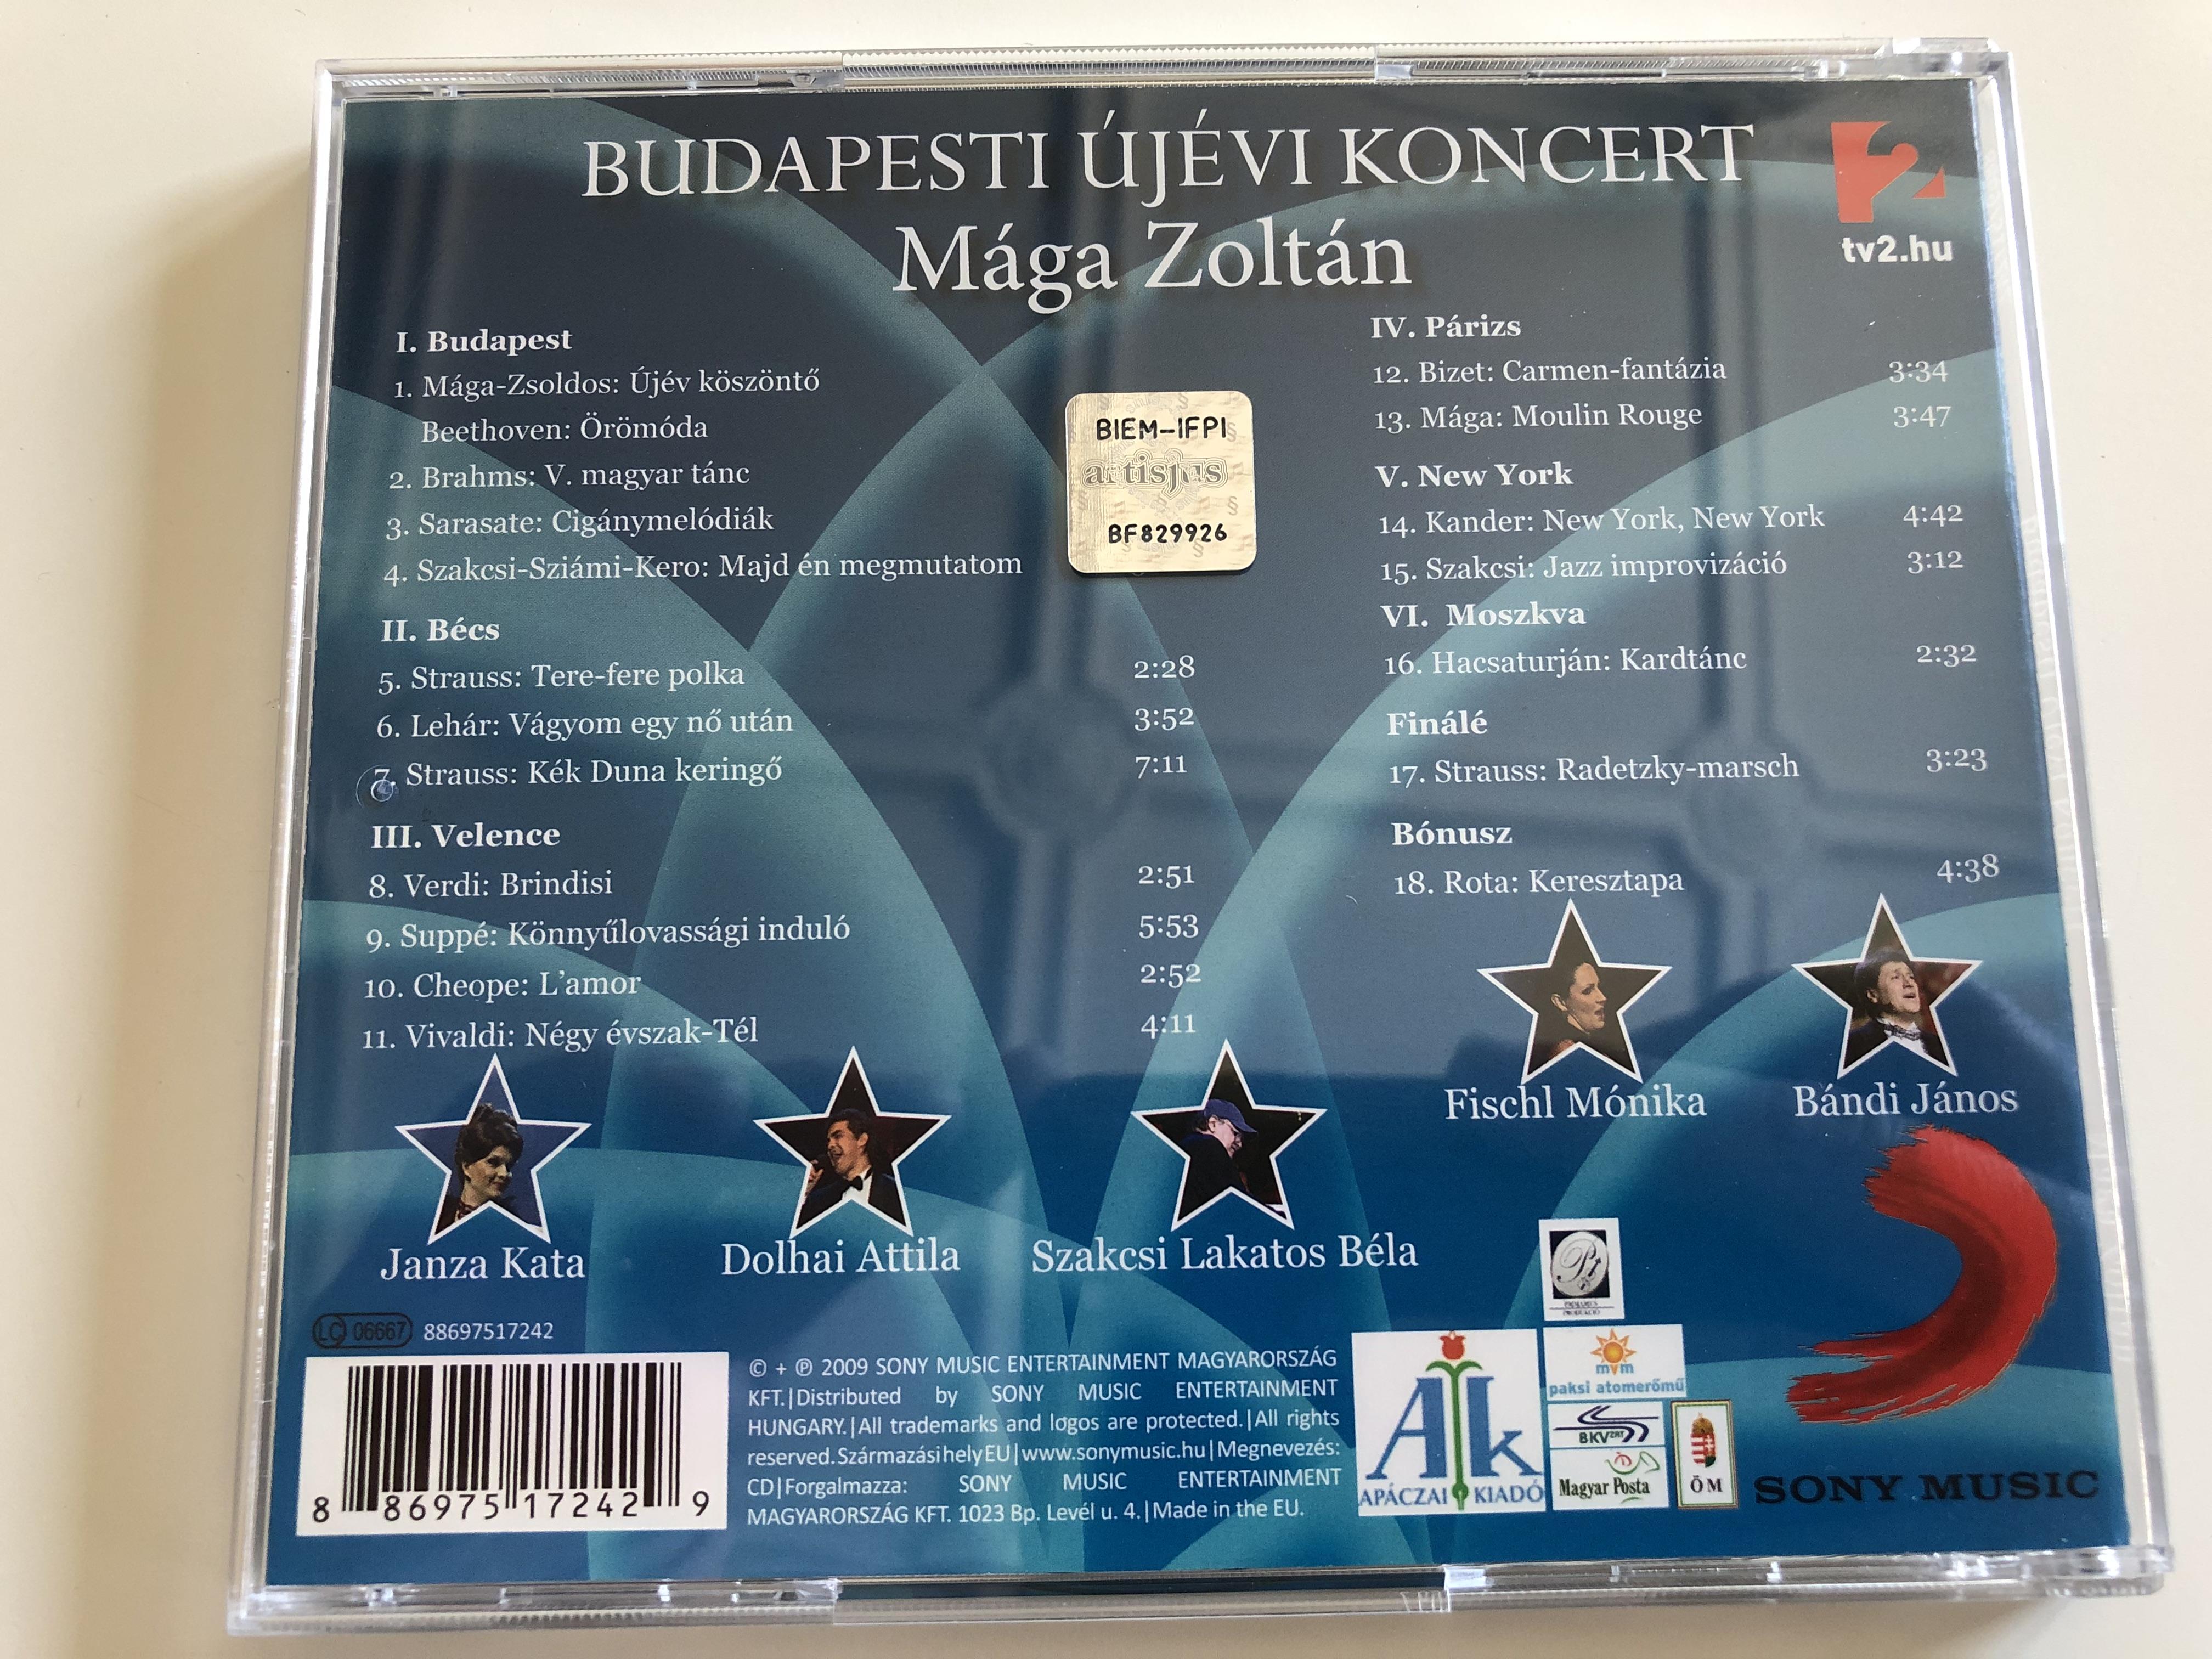 m-ga-zolt-n-budapesti-j-vi-koncert-2009-zen-s-utaz-s-a-vil-g-k-r-l-sony-music-entertainment-m-ga-zolt-n-s-szt-rvend-gei-audio-cd-2009-5-.jpg